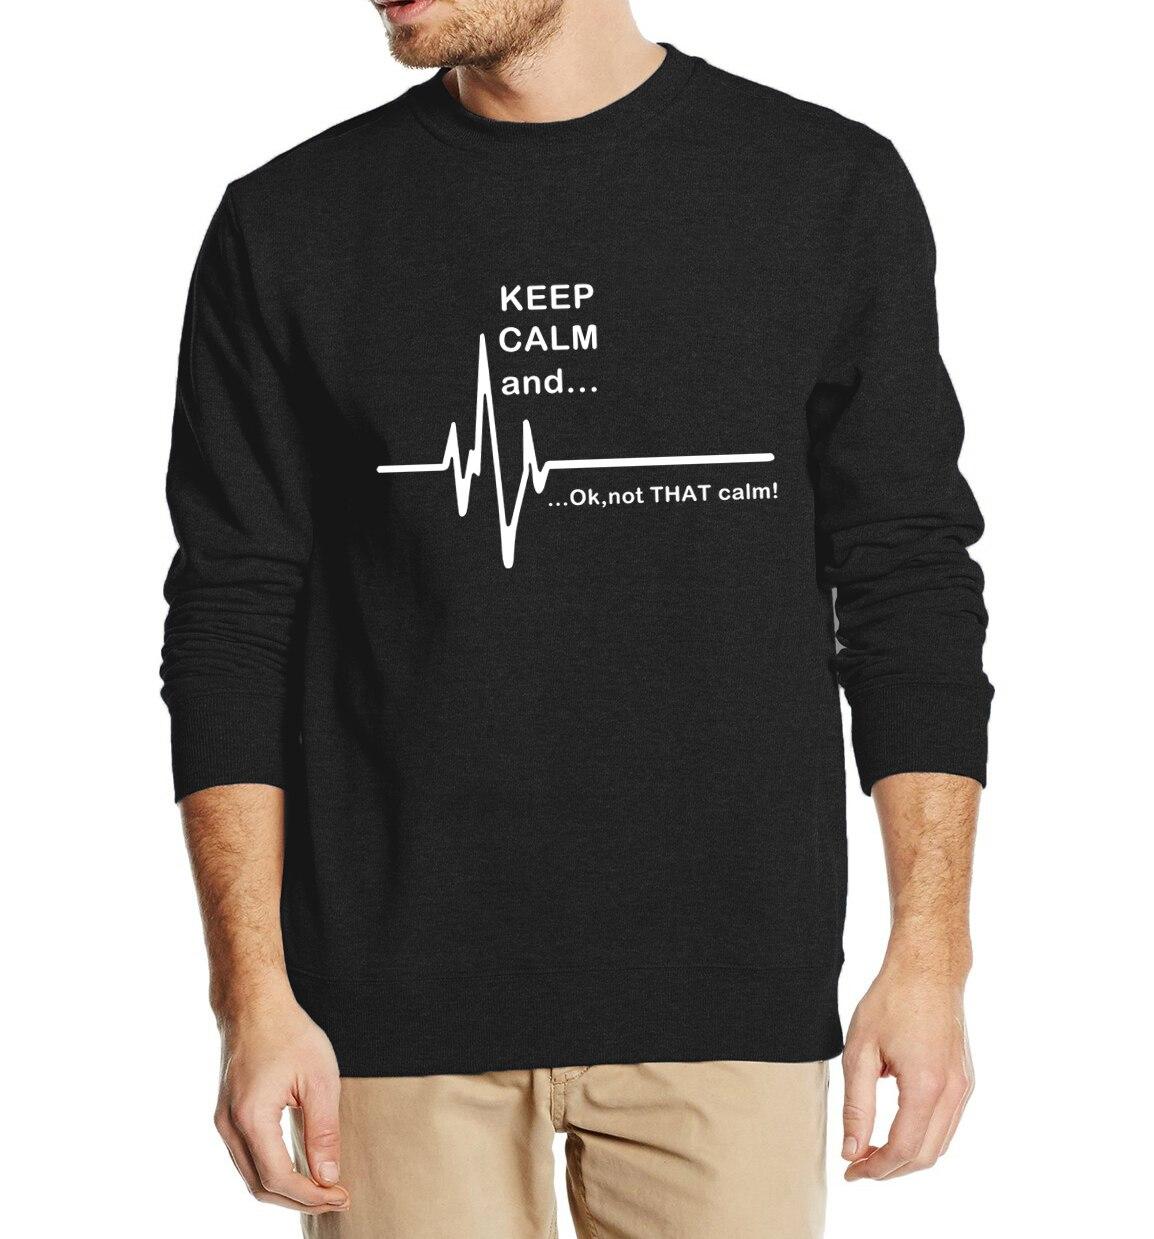 Funny Men Sweatshirts EKG Heart Rate male hooded 2019 autumn winter style new fashion casual man hoodies hip hop streetwear bluza star labs